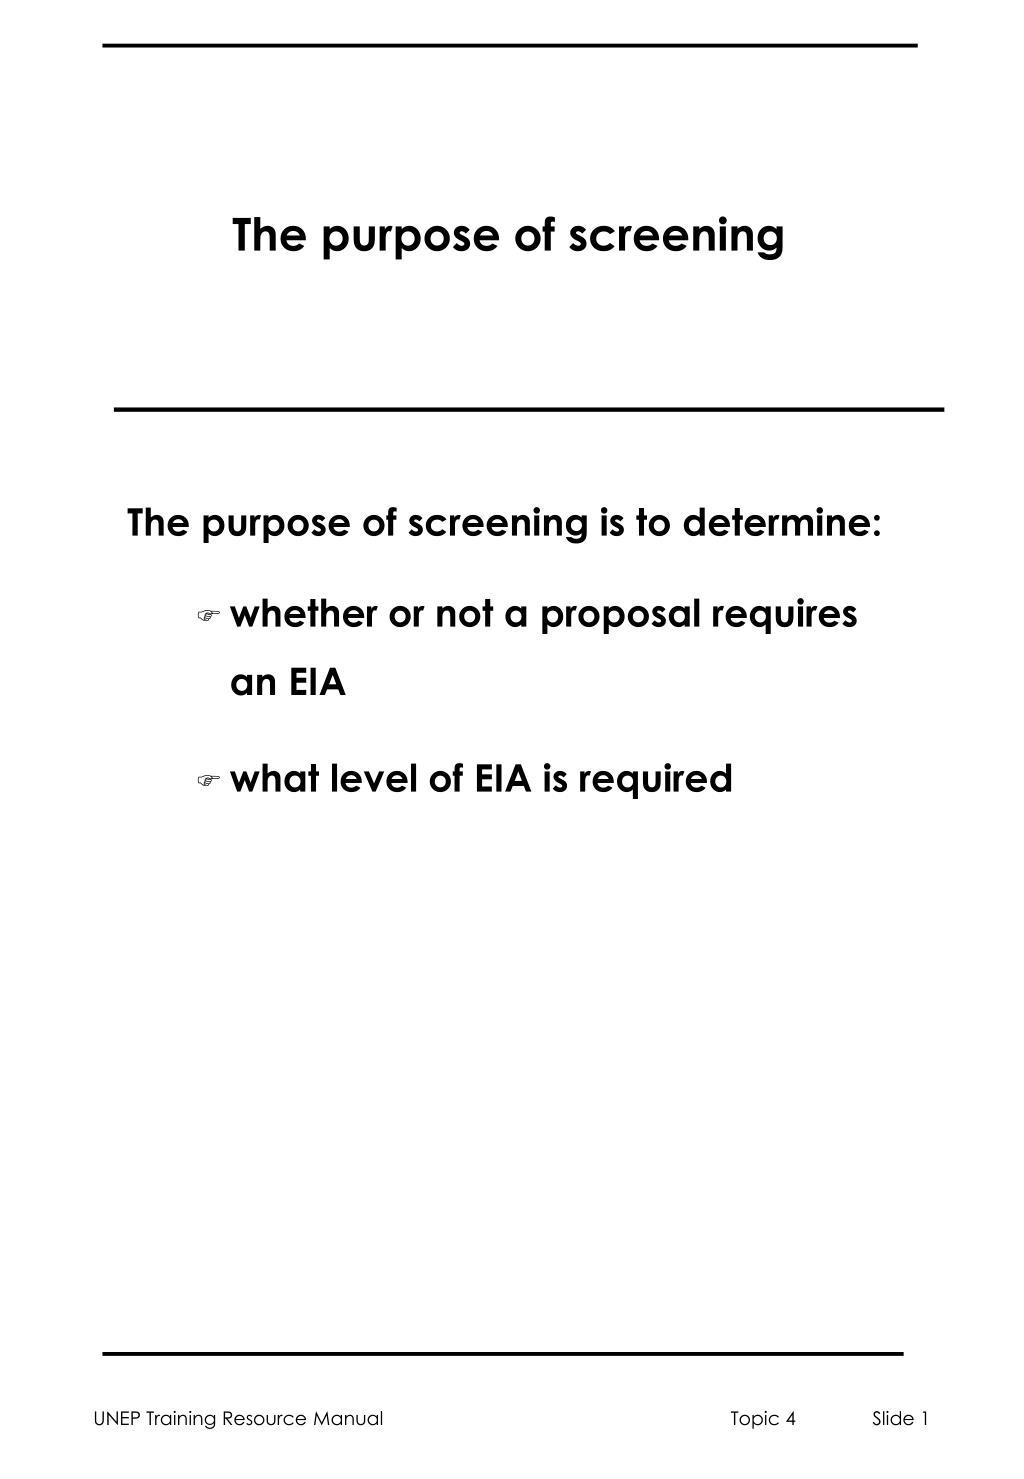 the purpose of screening